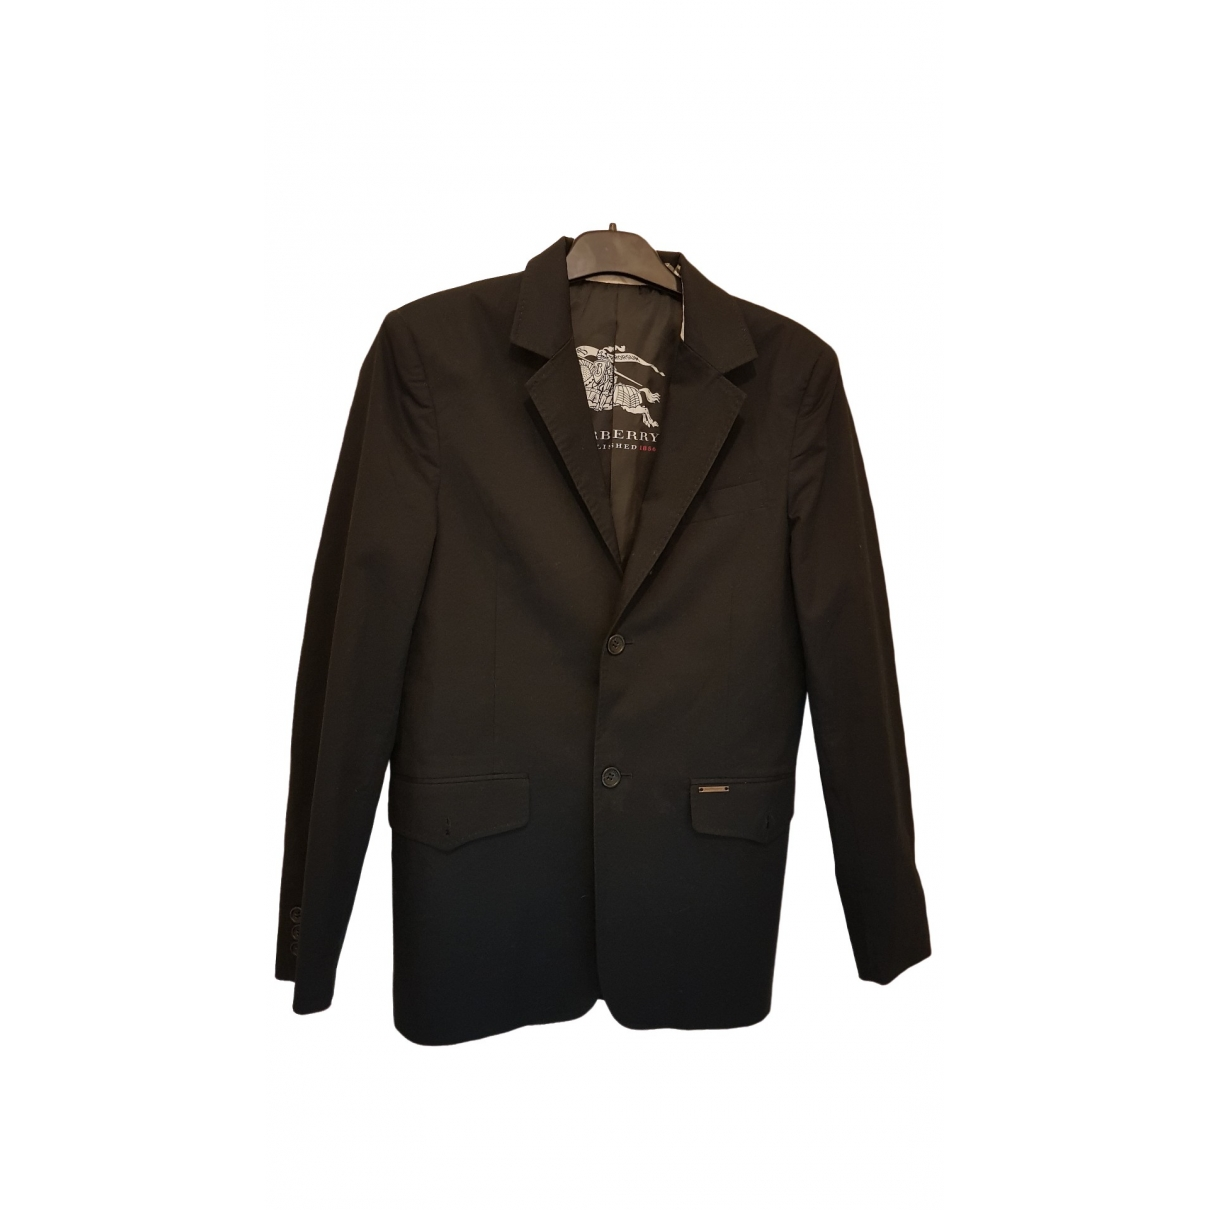 Burberry \N Black Cotton jacket  for Men S International